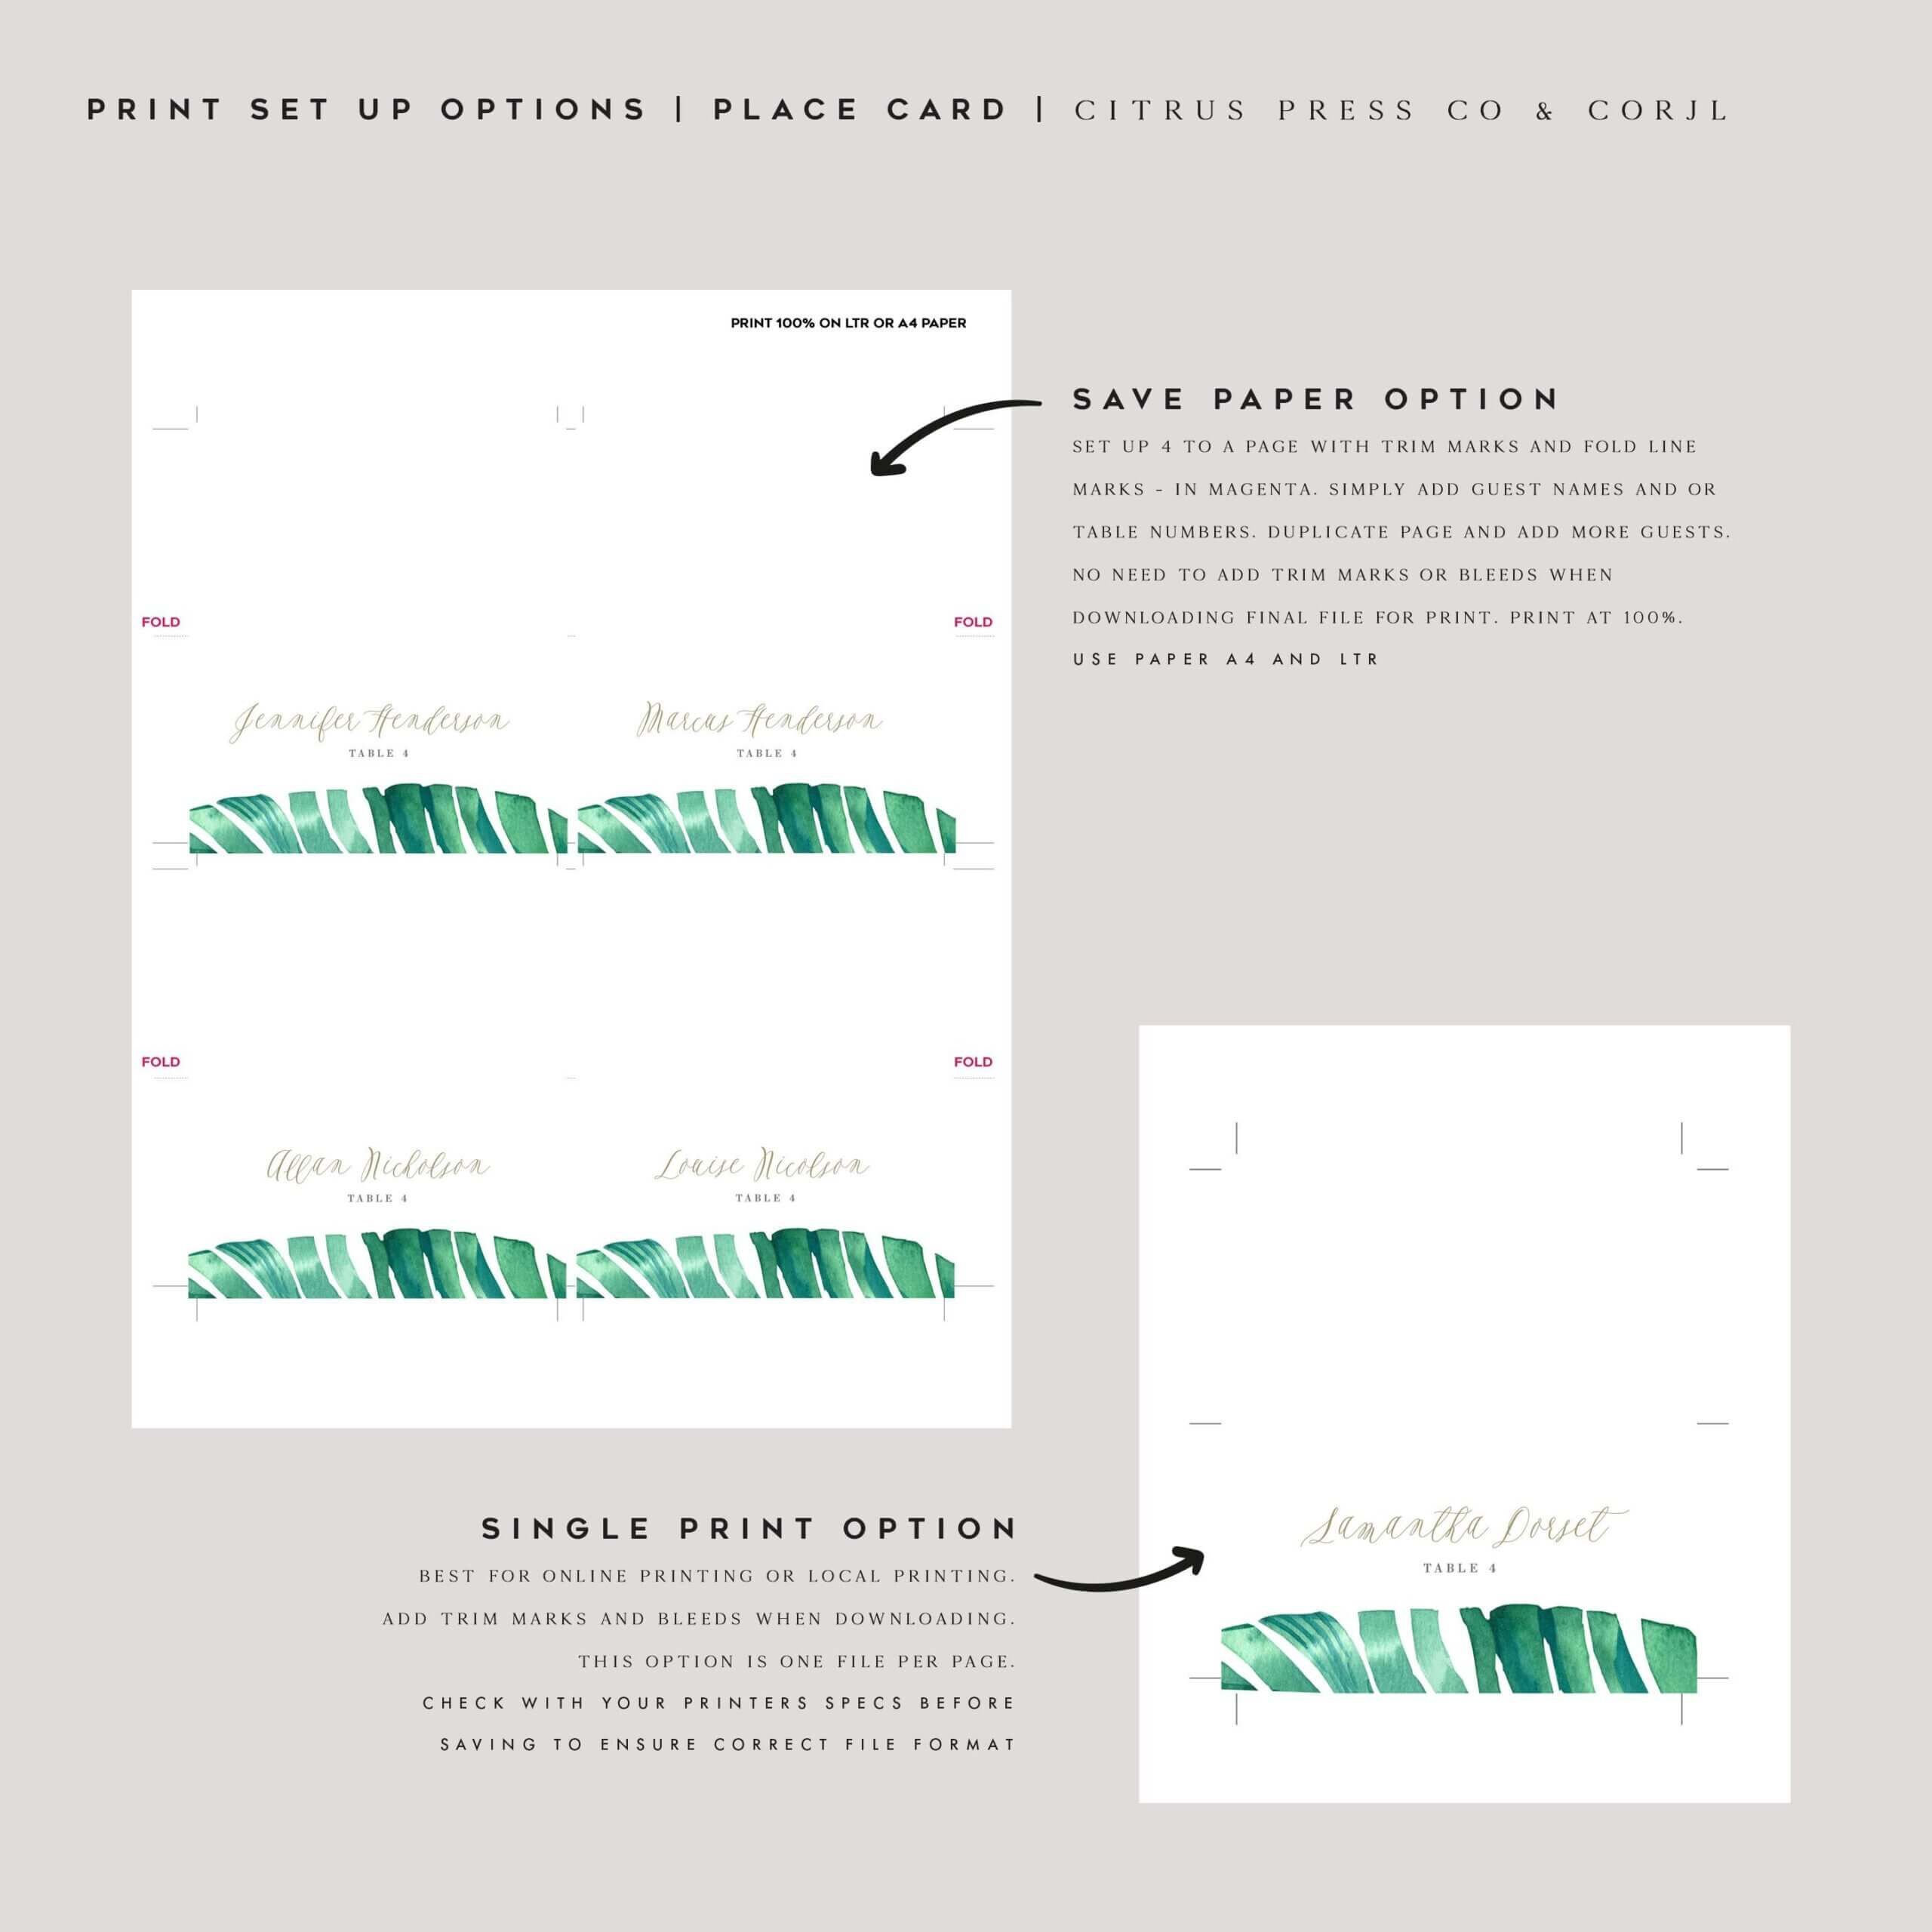 032 Template Ideas Corjl Place Card Wedding Editable Throughout Place Card Template 6 Per Sheet